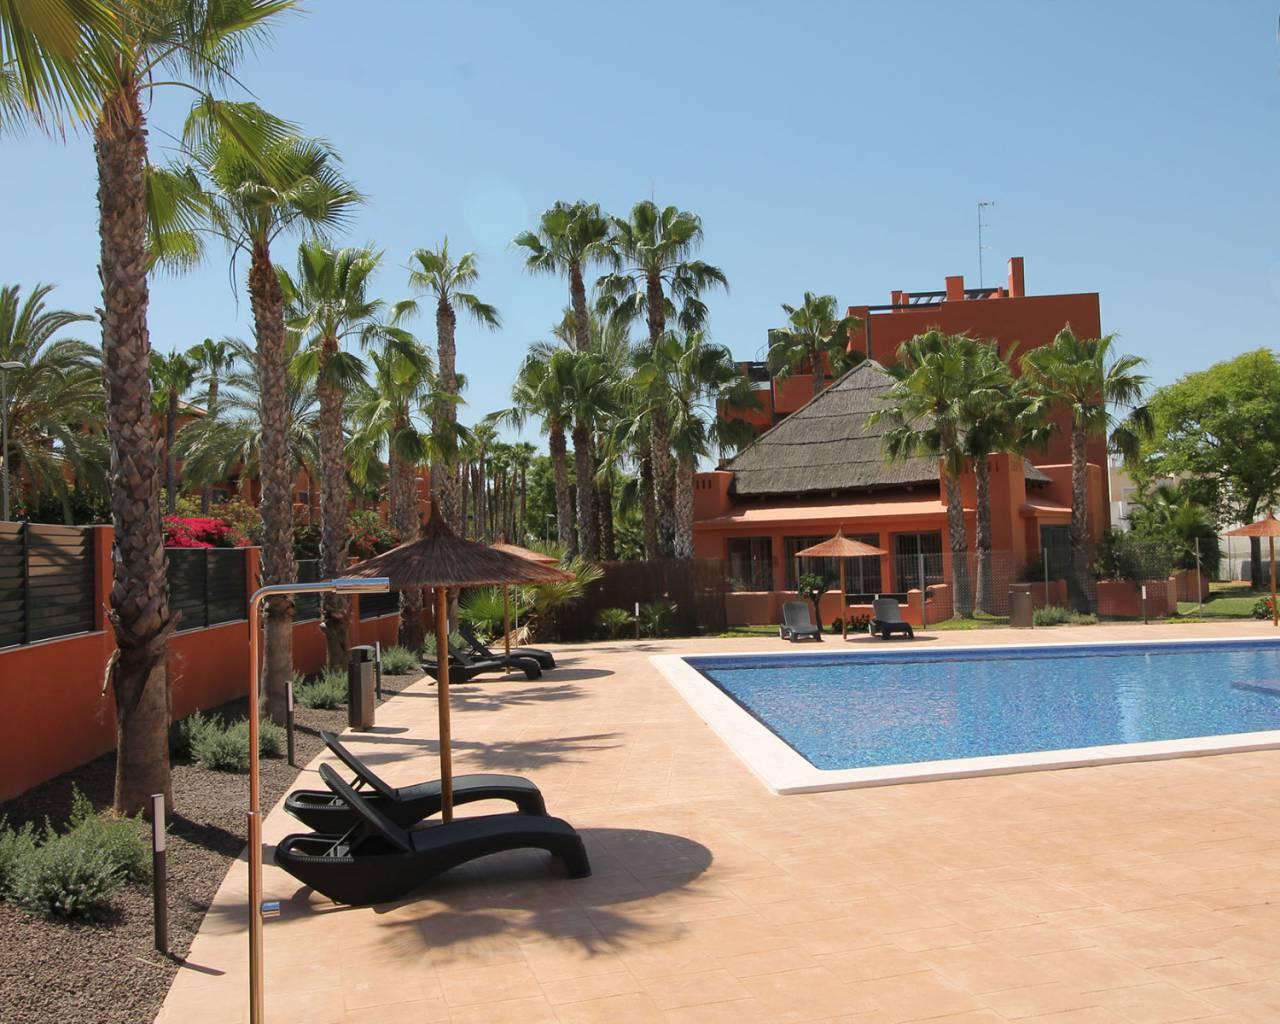 nieuwbouw-appartement-orihuela-costa-villamartin-golf_3293_xl